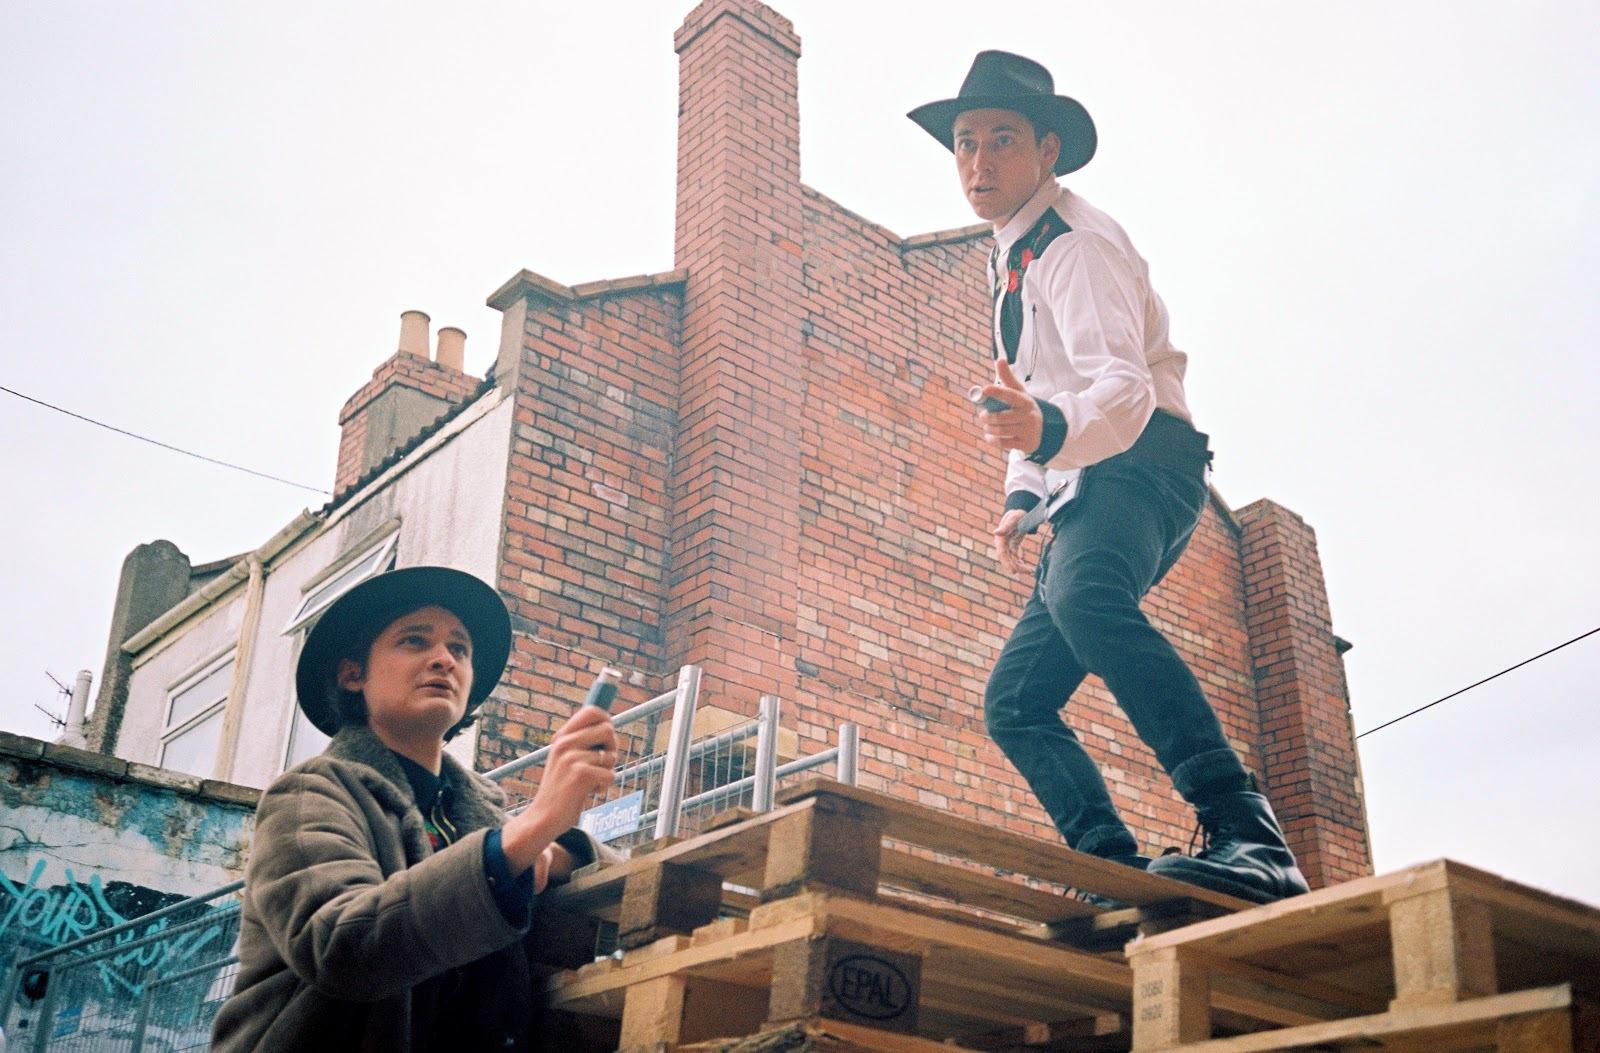 JUMBO release double A-side 'Chump' / 'Mute'